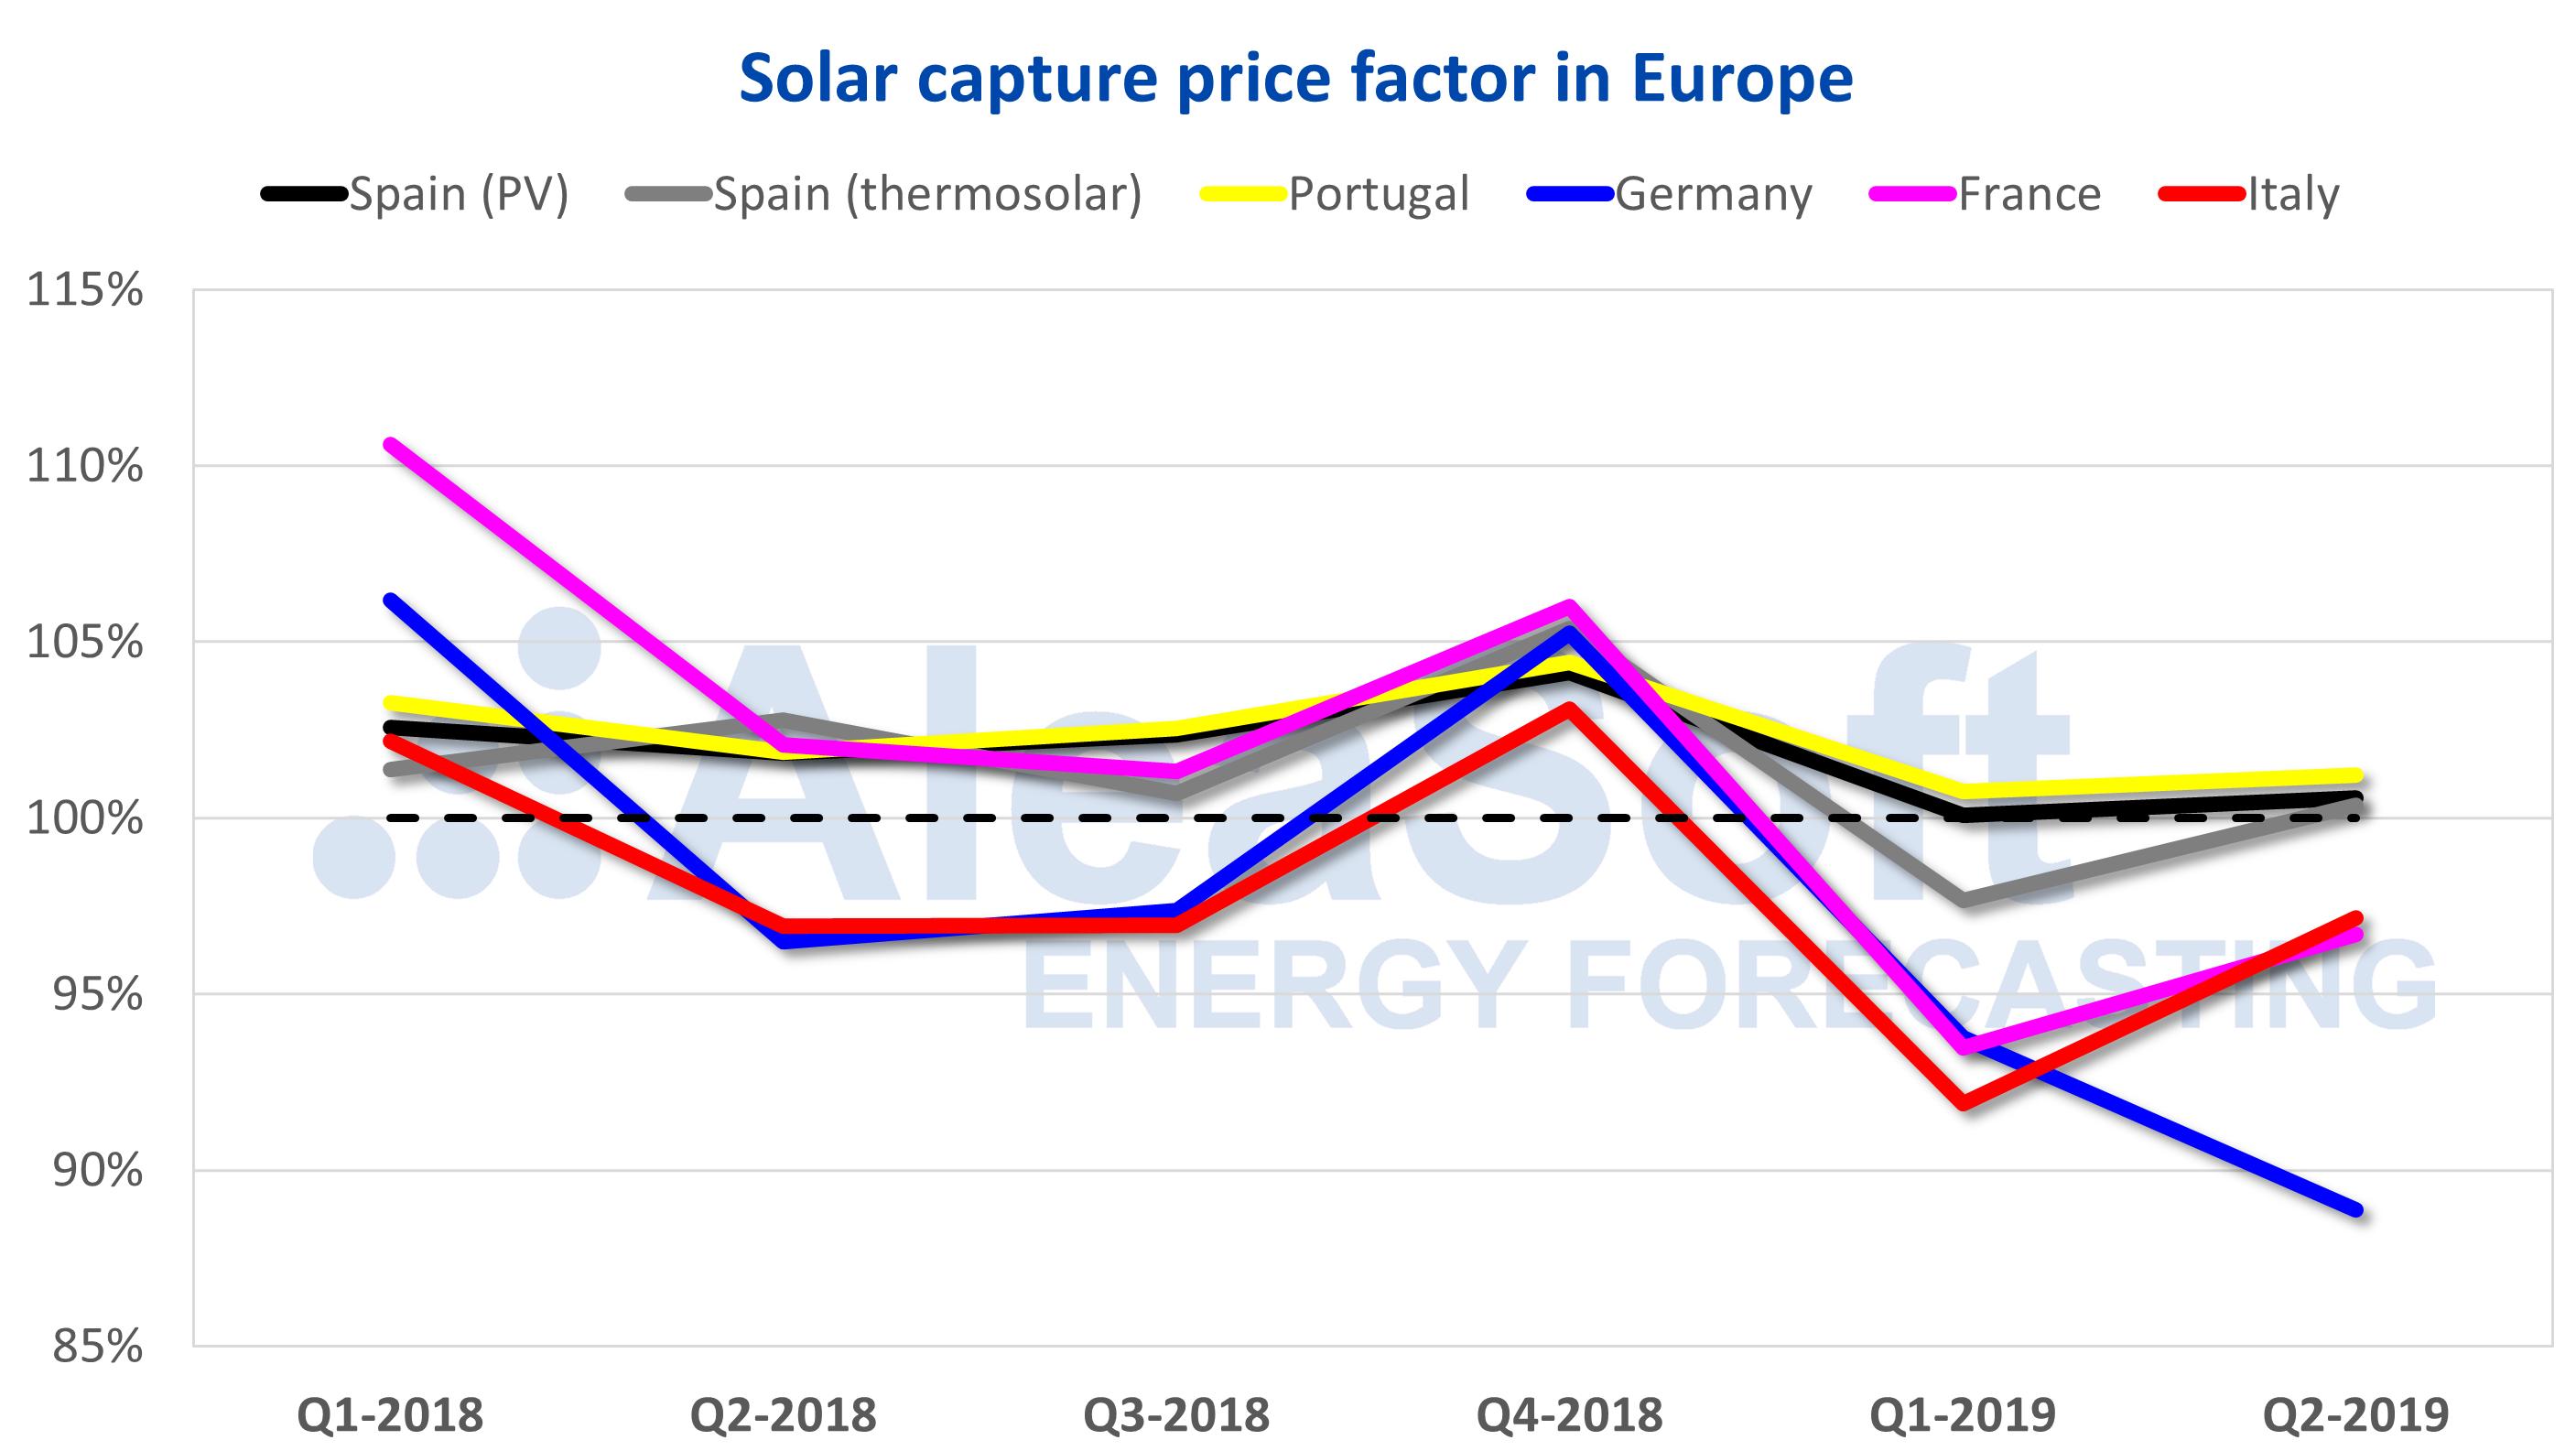 AleaSoft - Solar photovoltaic thermosolar capture price Europe